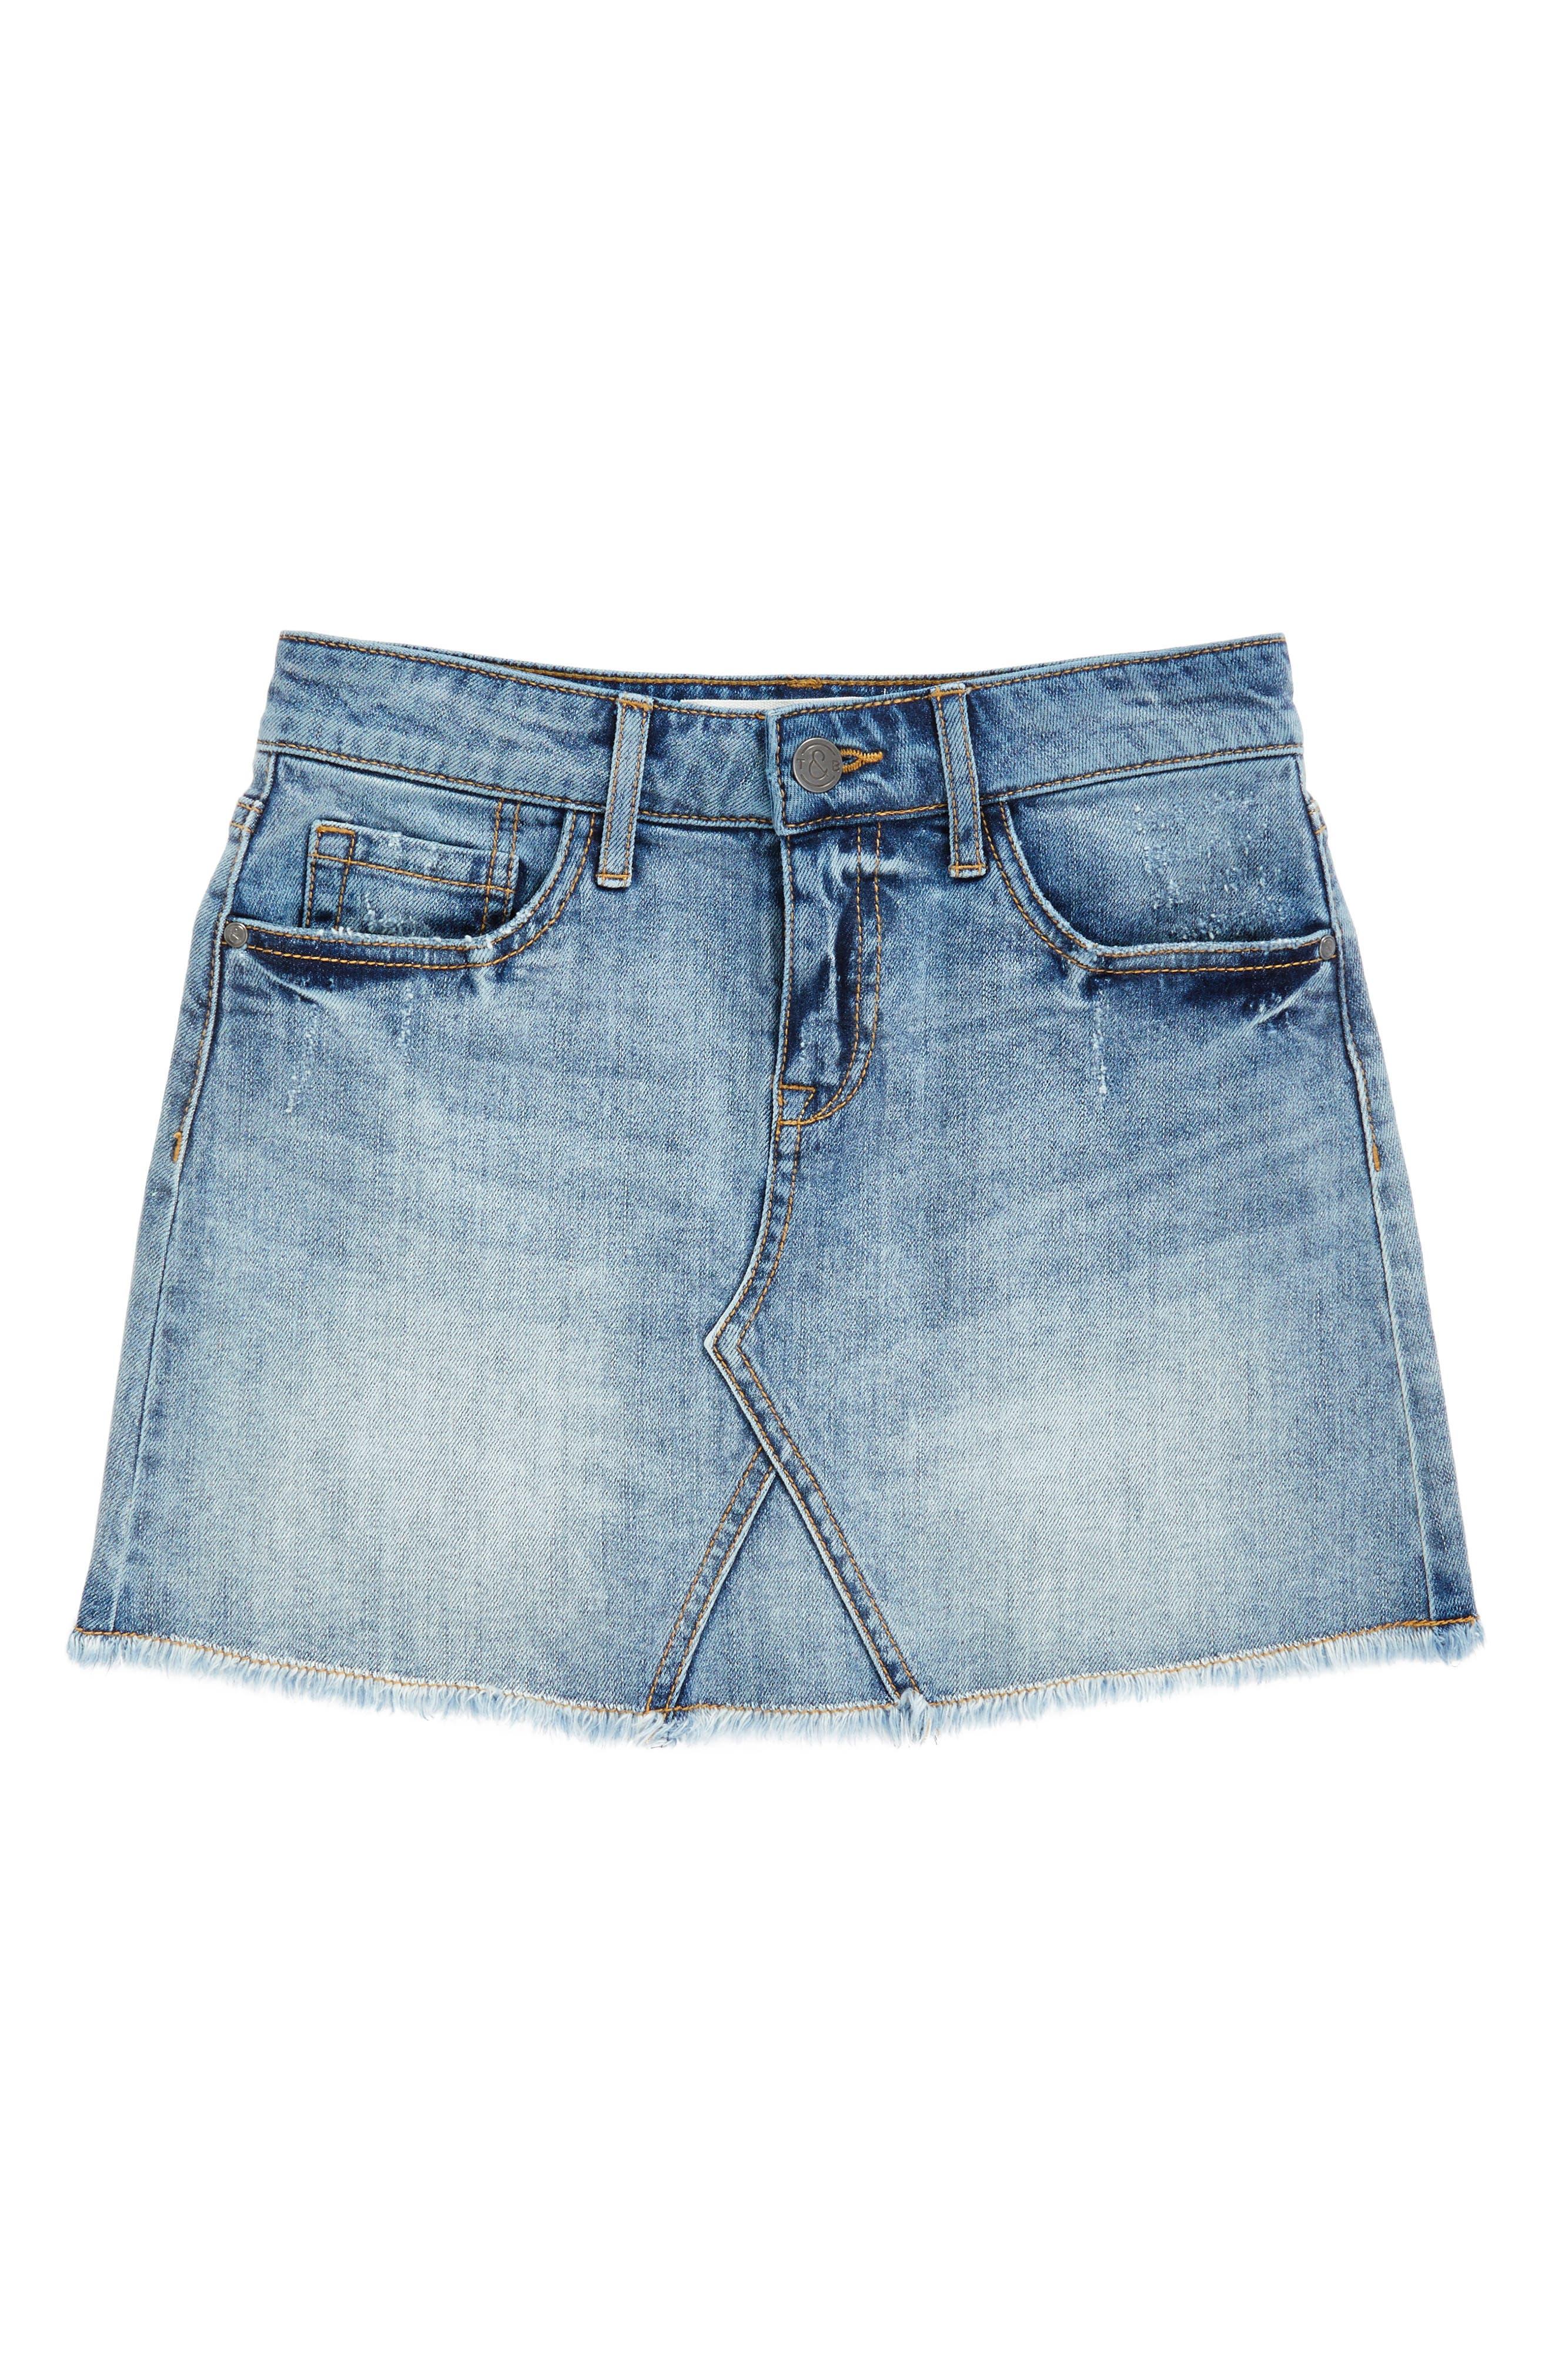 Treasure & Bond Cutoff Denim Skirt (Big Girls)